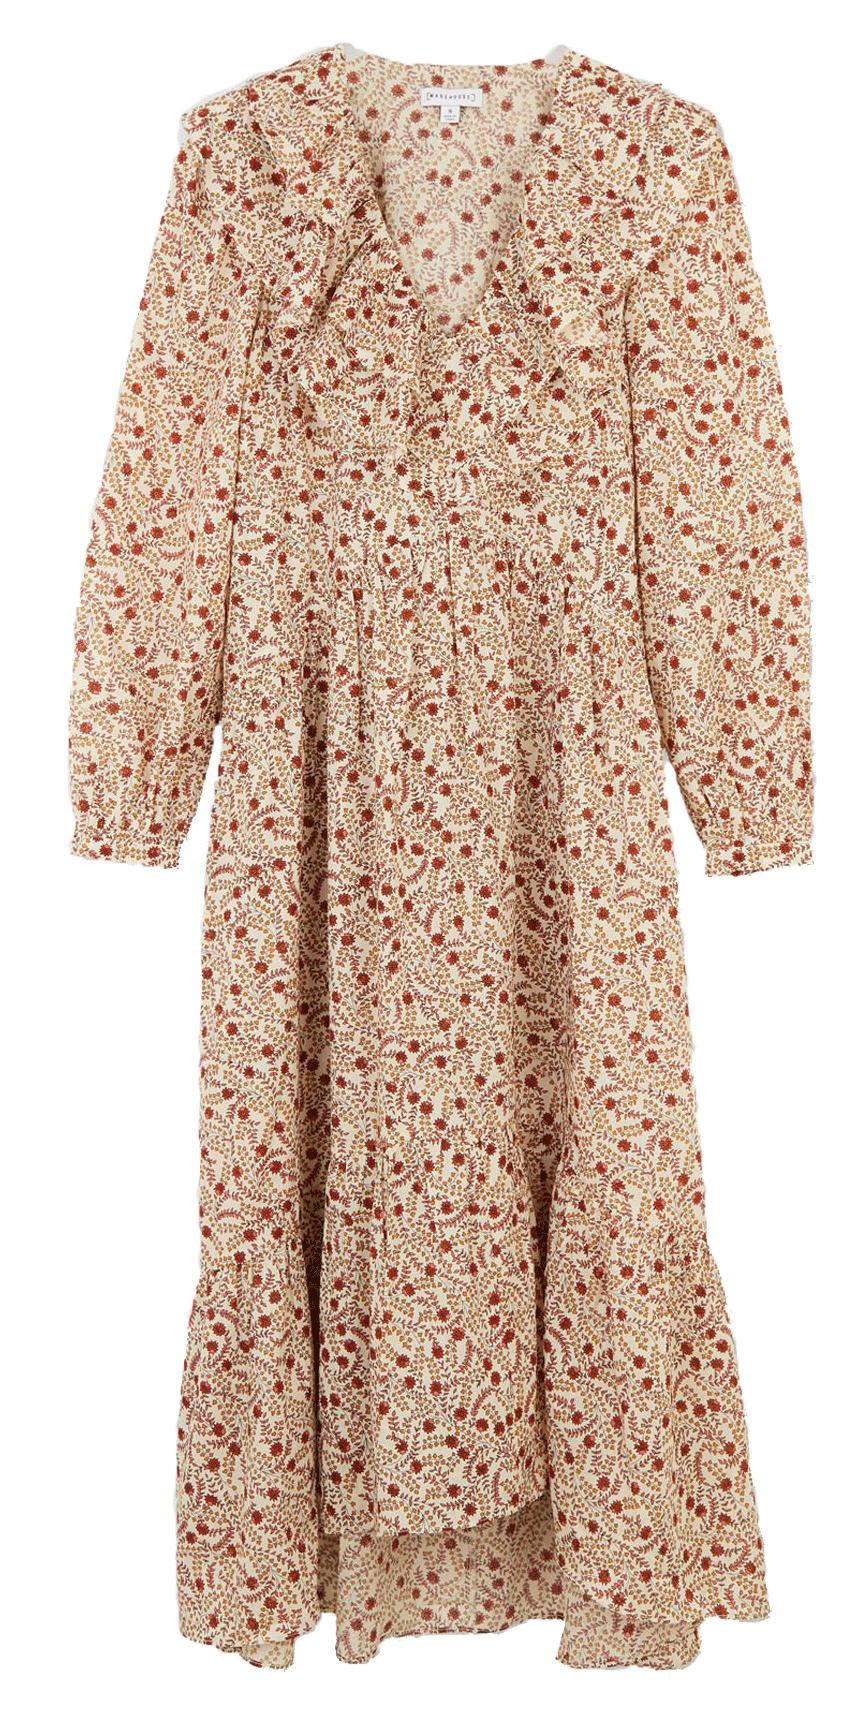 Warehouse poplin dress with frilled neck line.